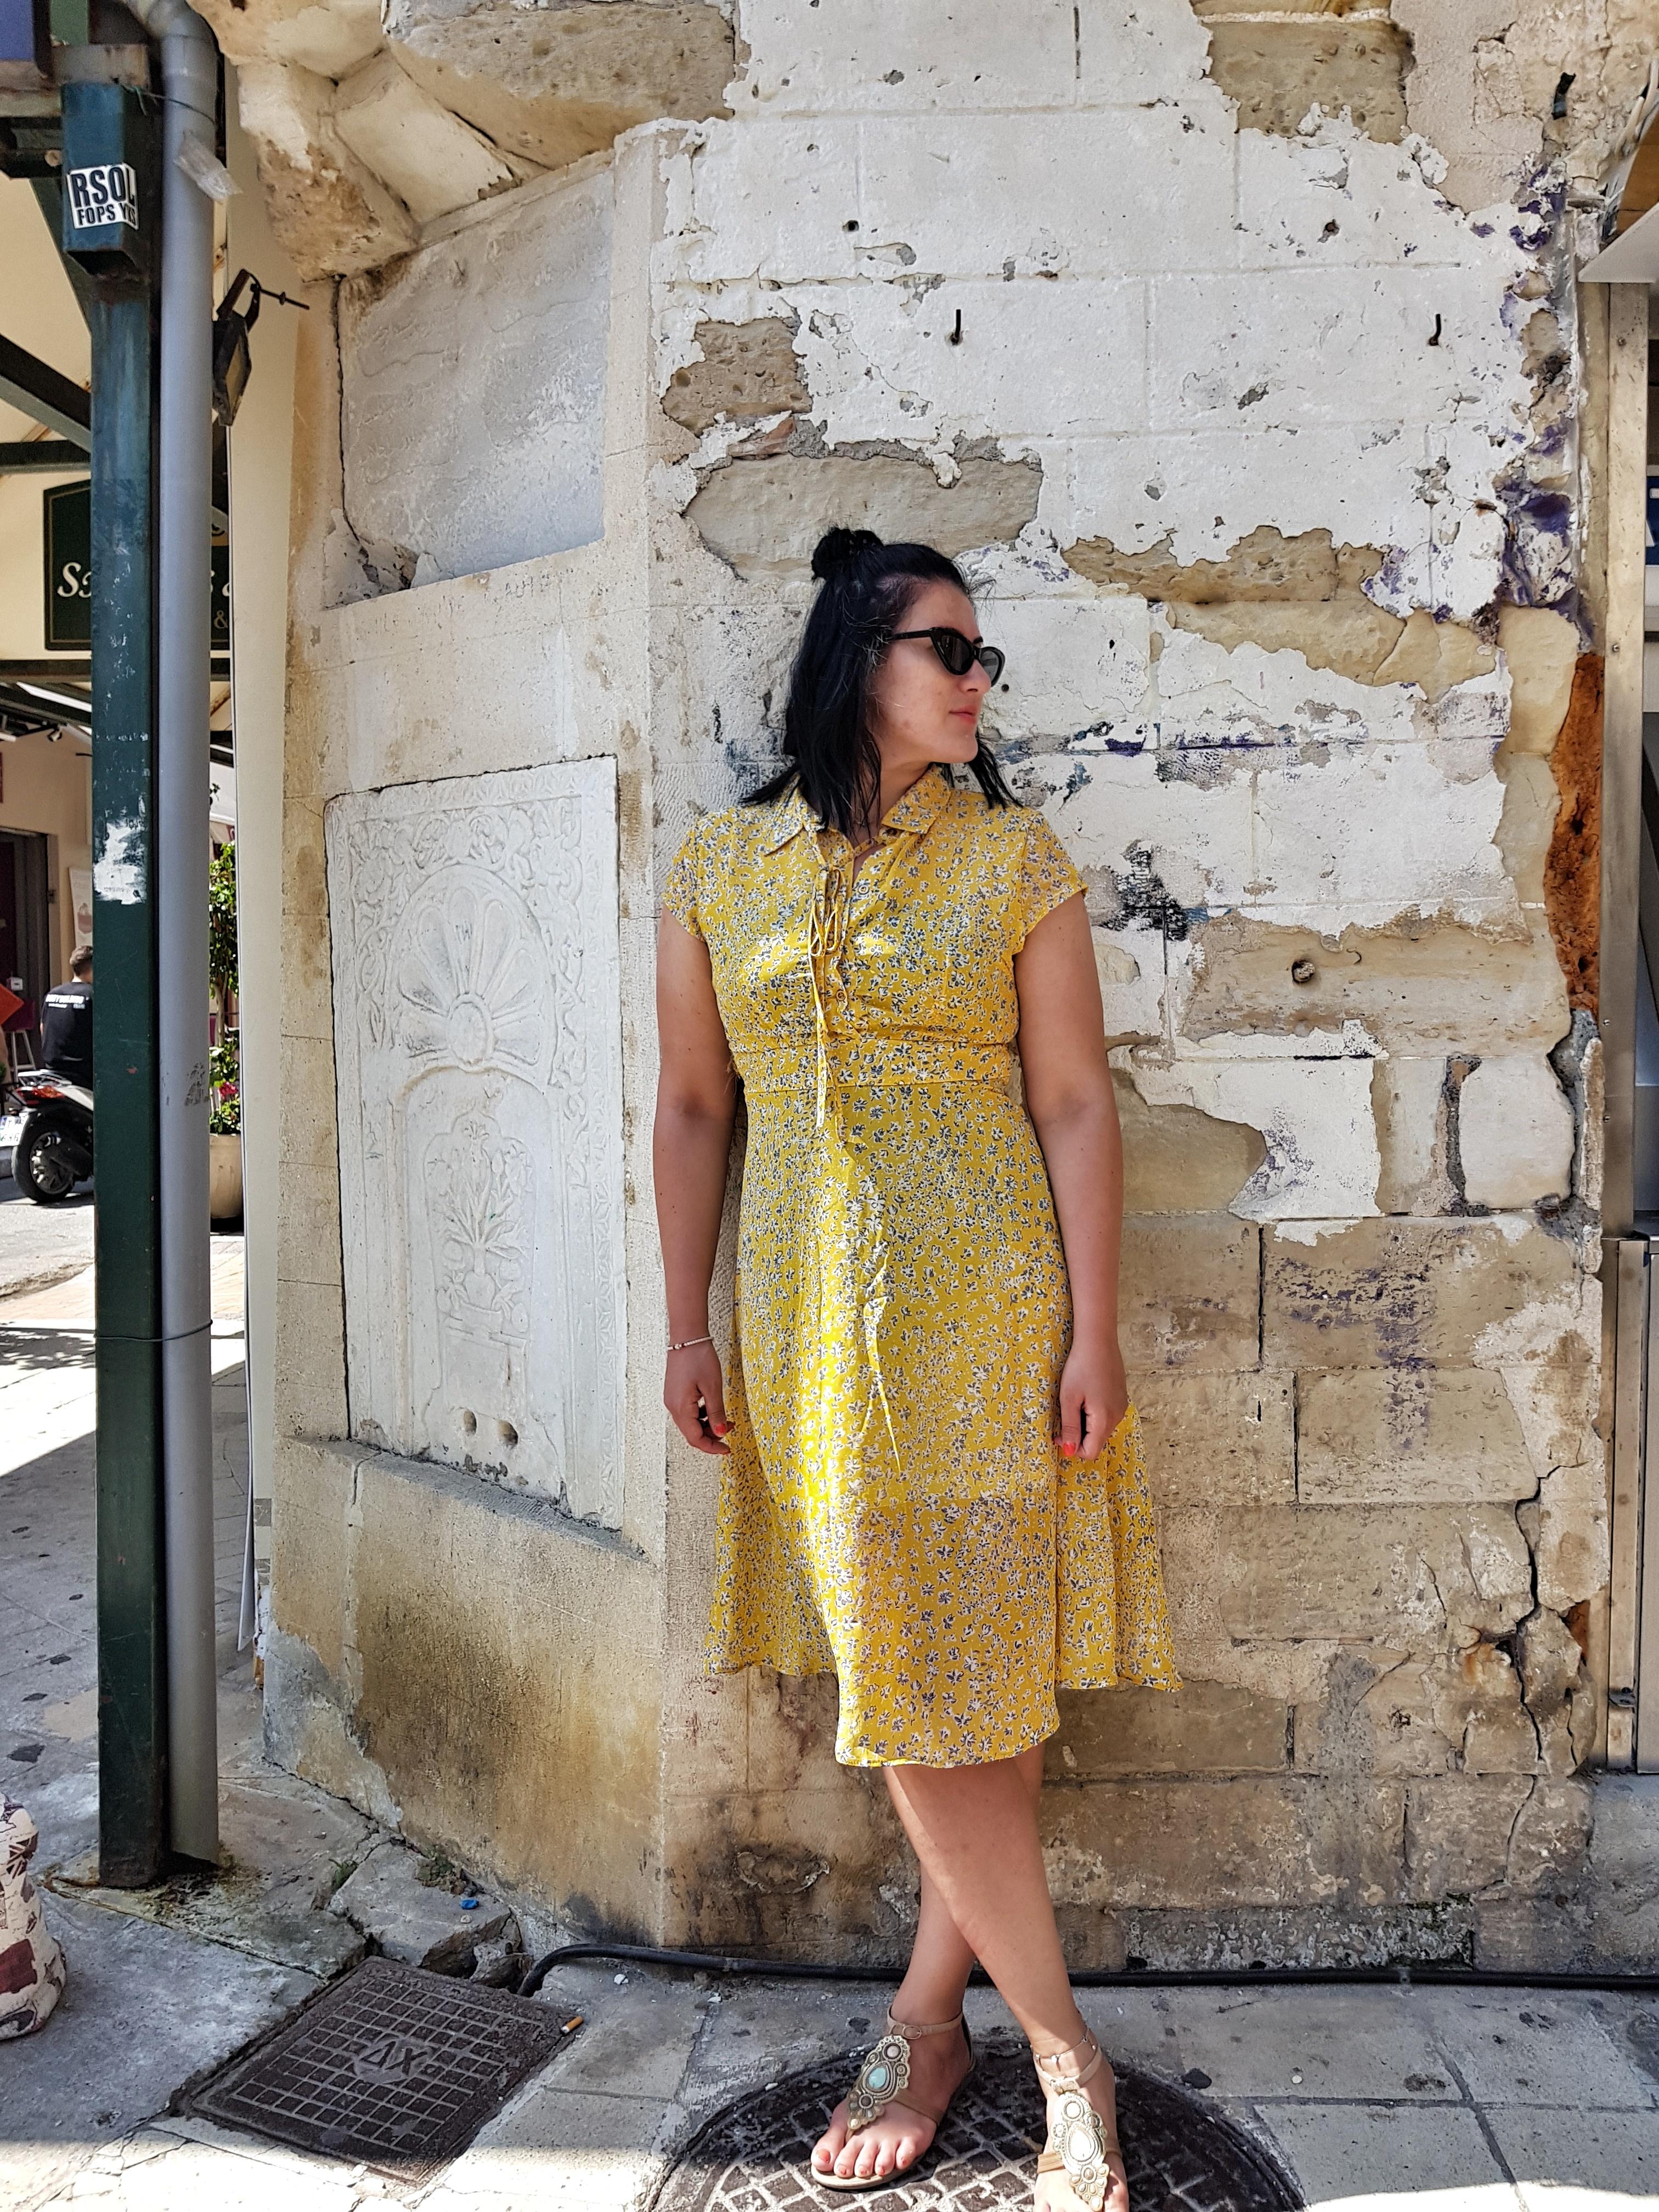 floral_print_yellow_dress_zaful_island_crete_review